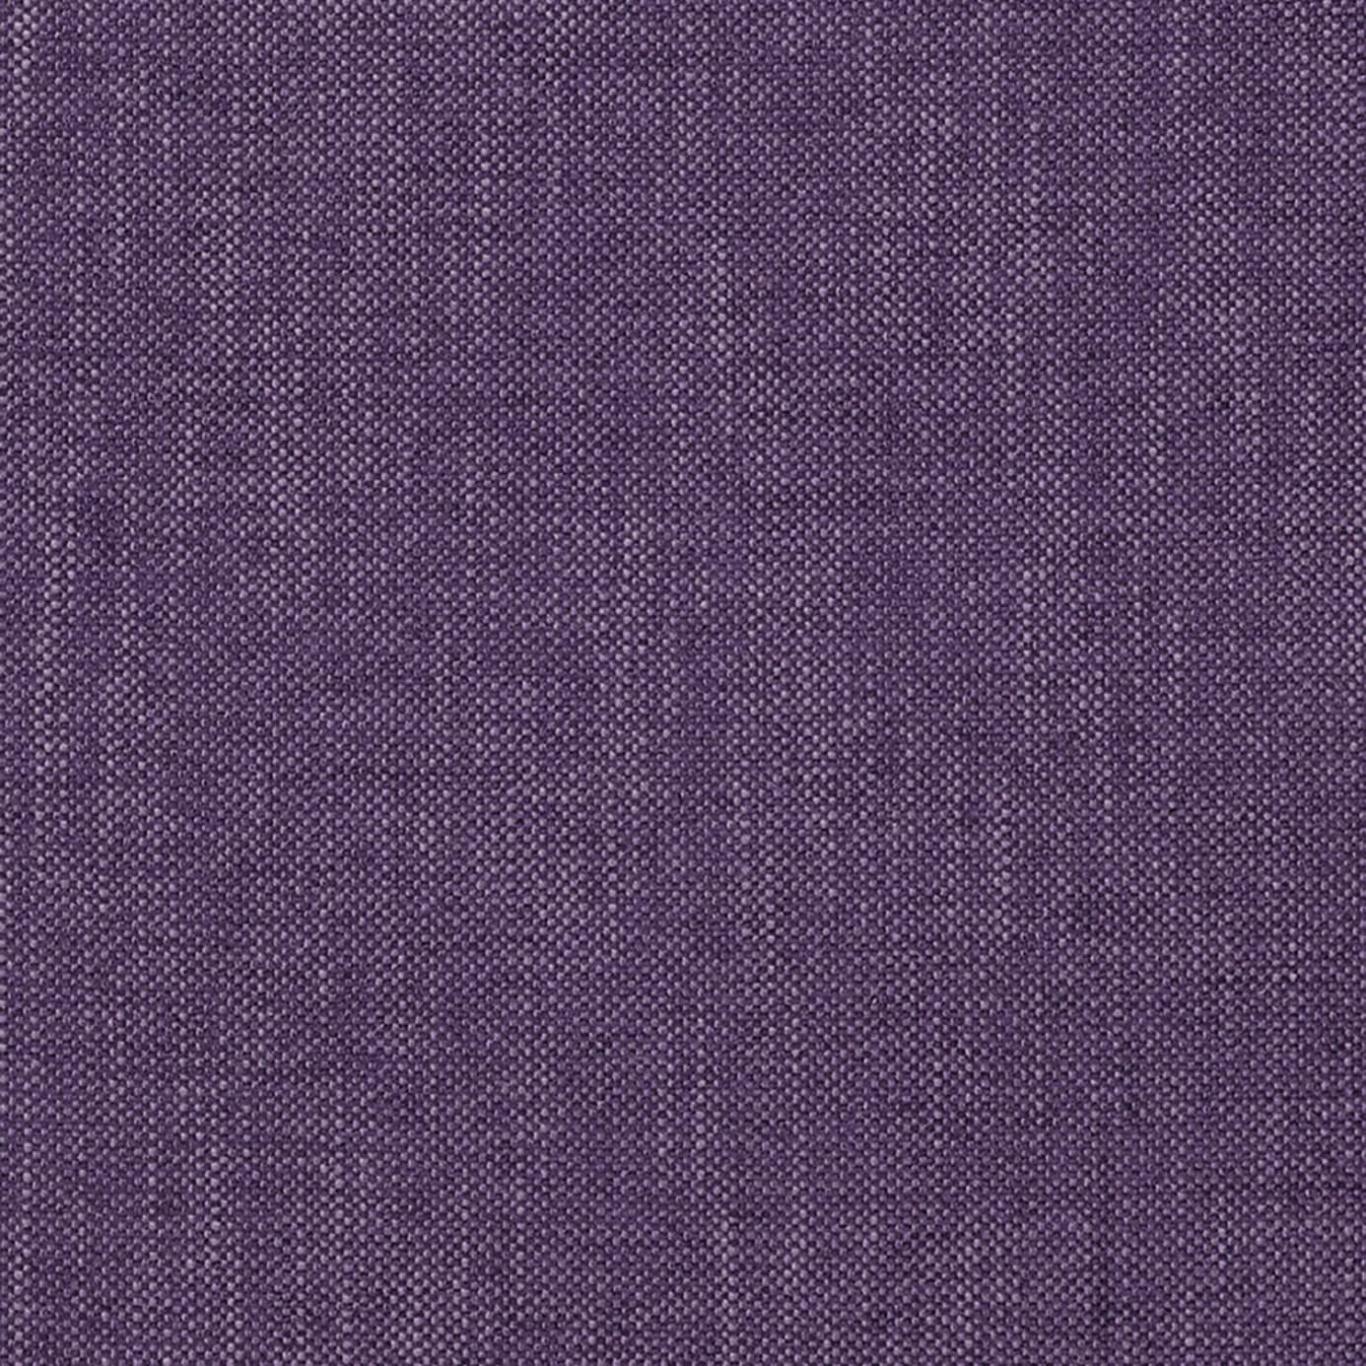 Image of Harlequin Molecule Prune Fabric 440140